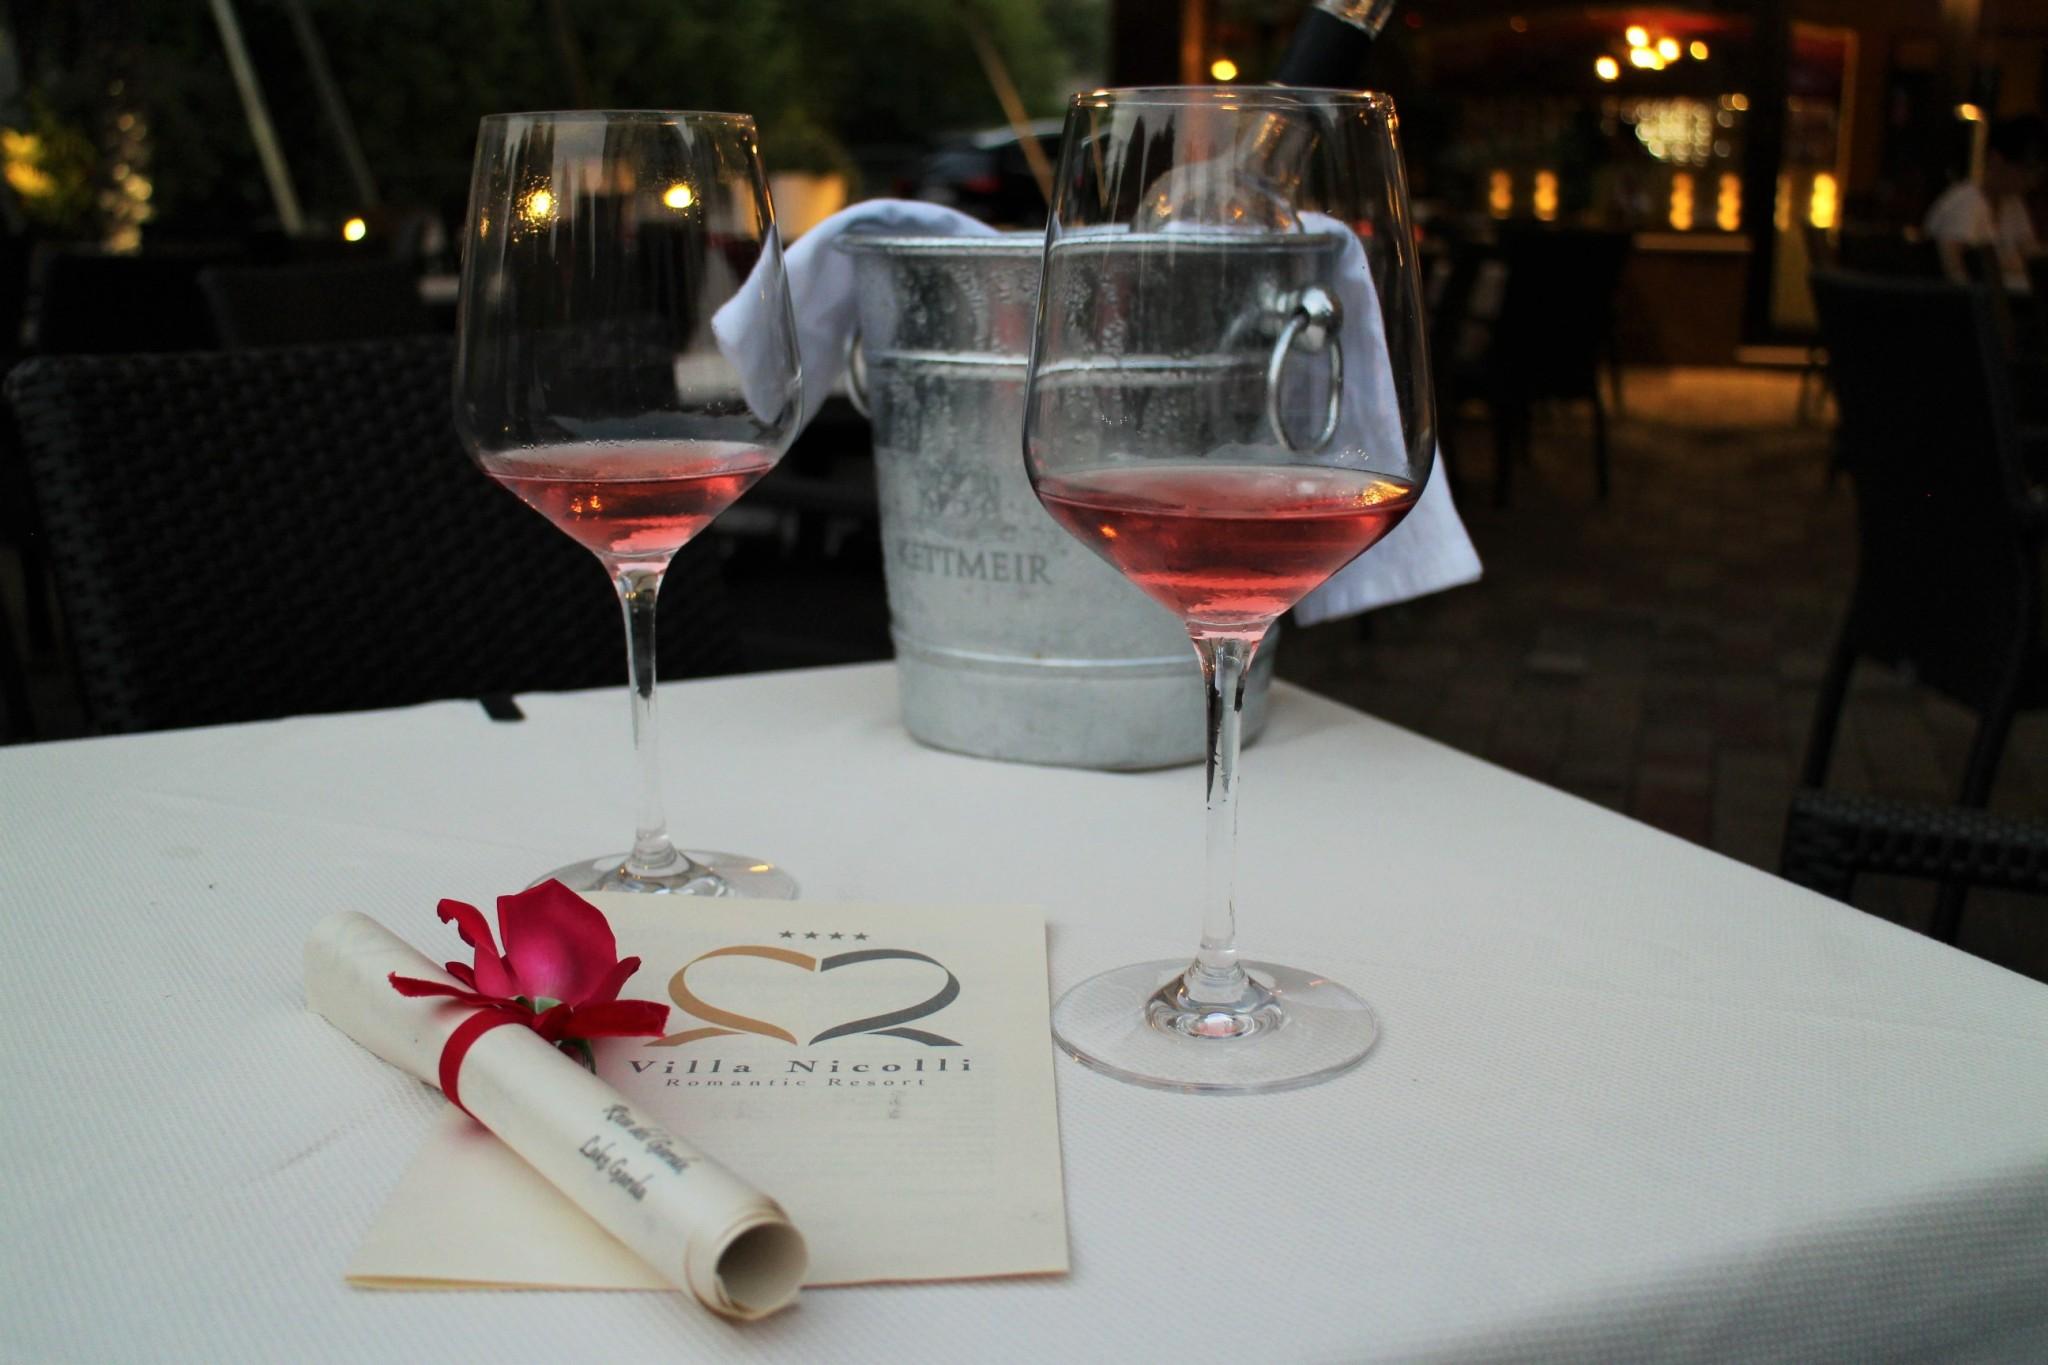 Villa Nicolli Romantic Resort kokemuksia 2